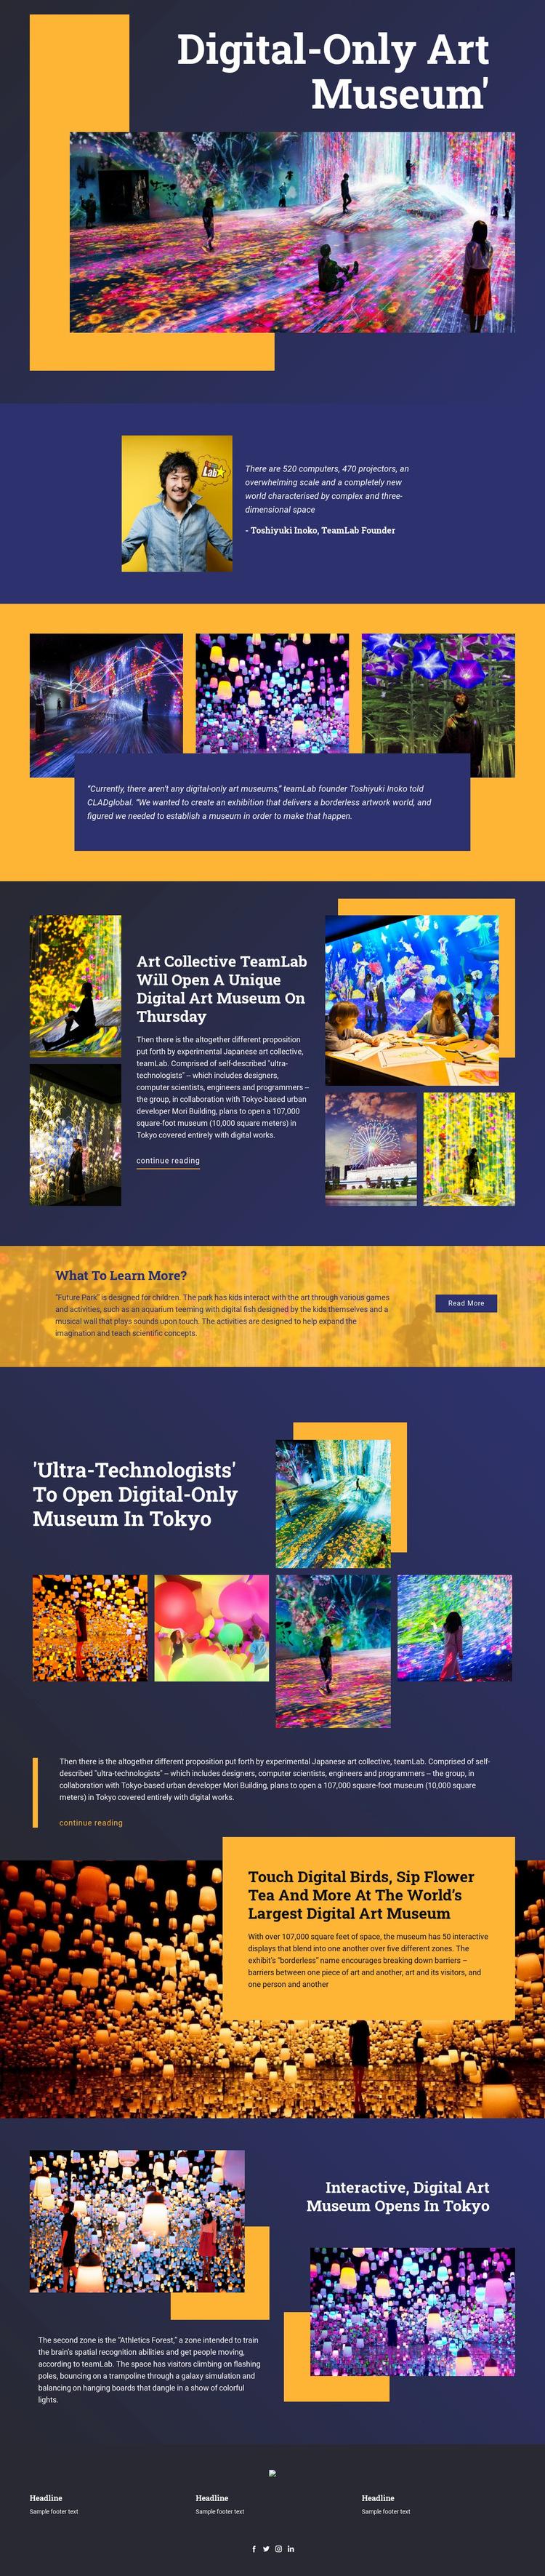 Digital Art Museum Web Page Design